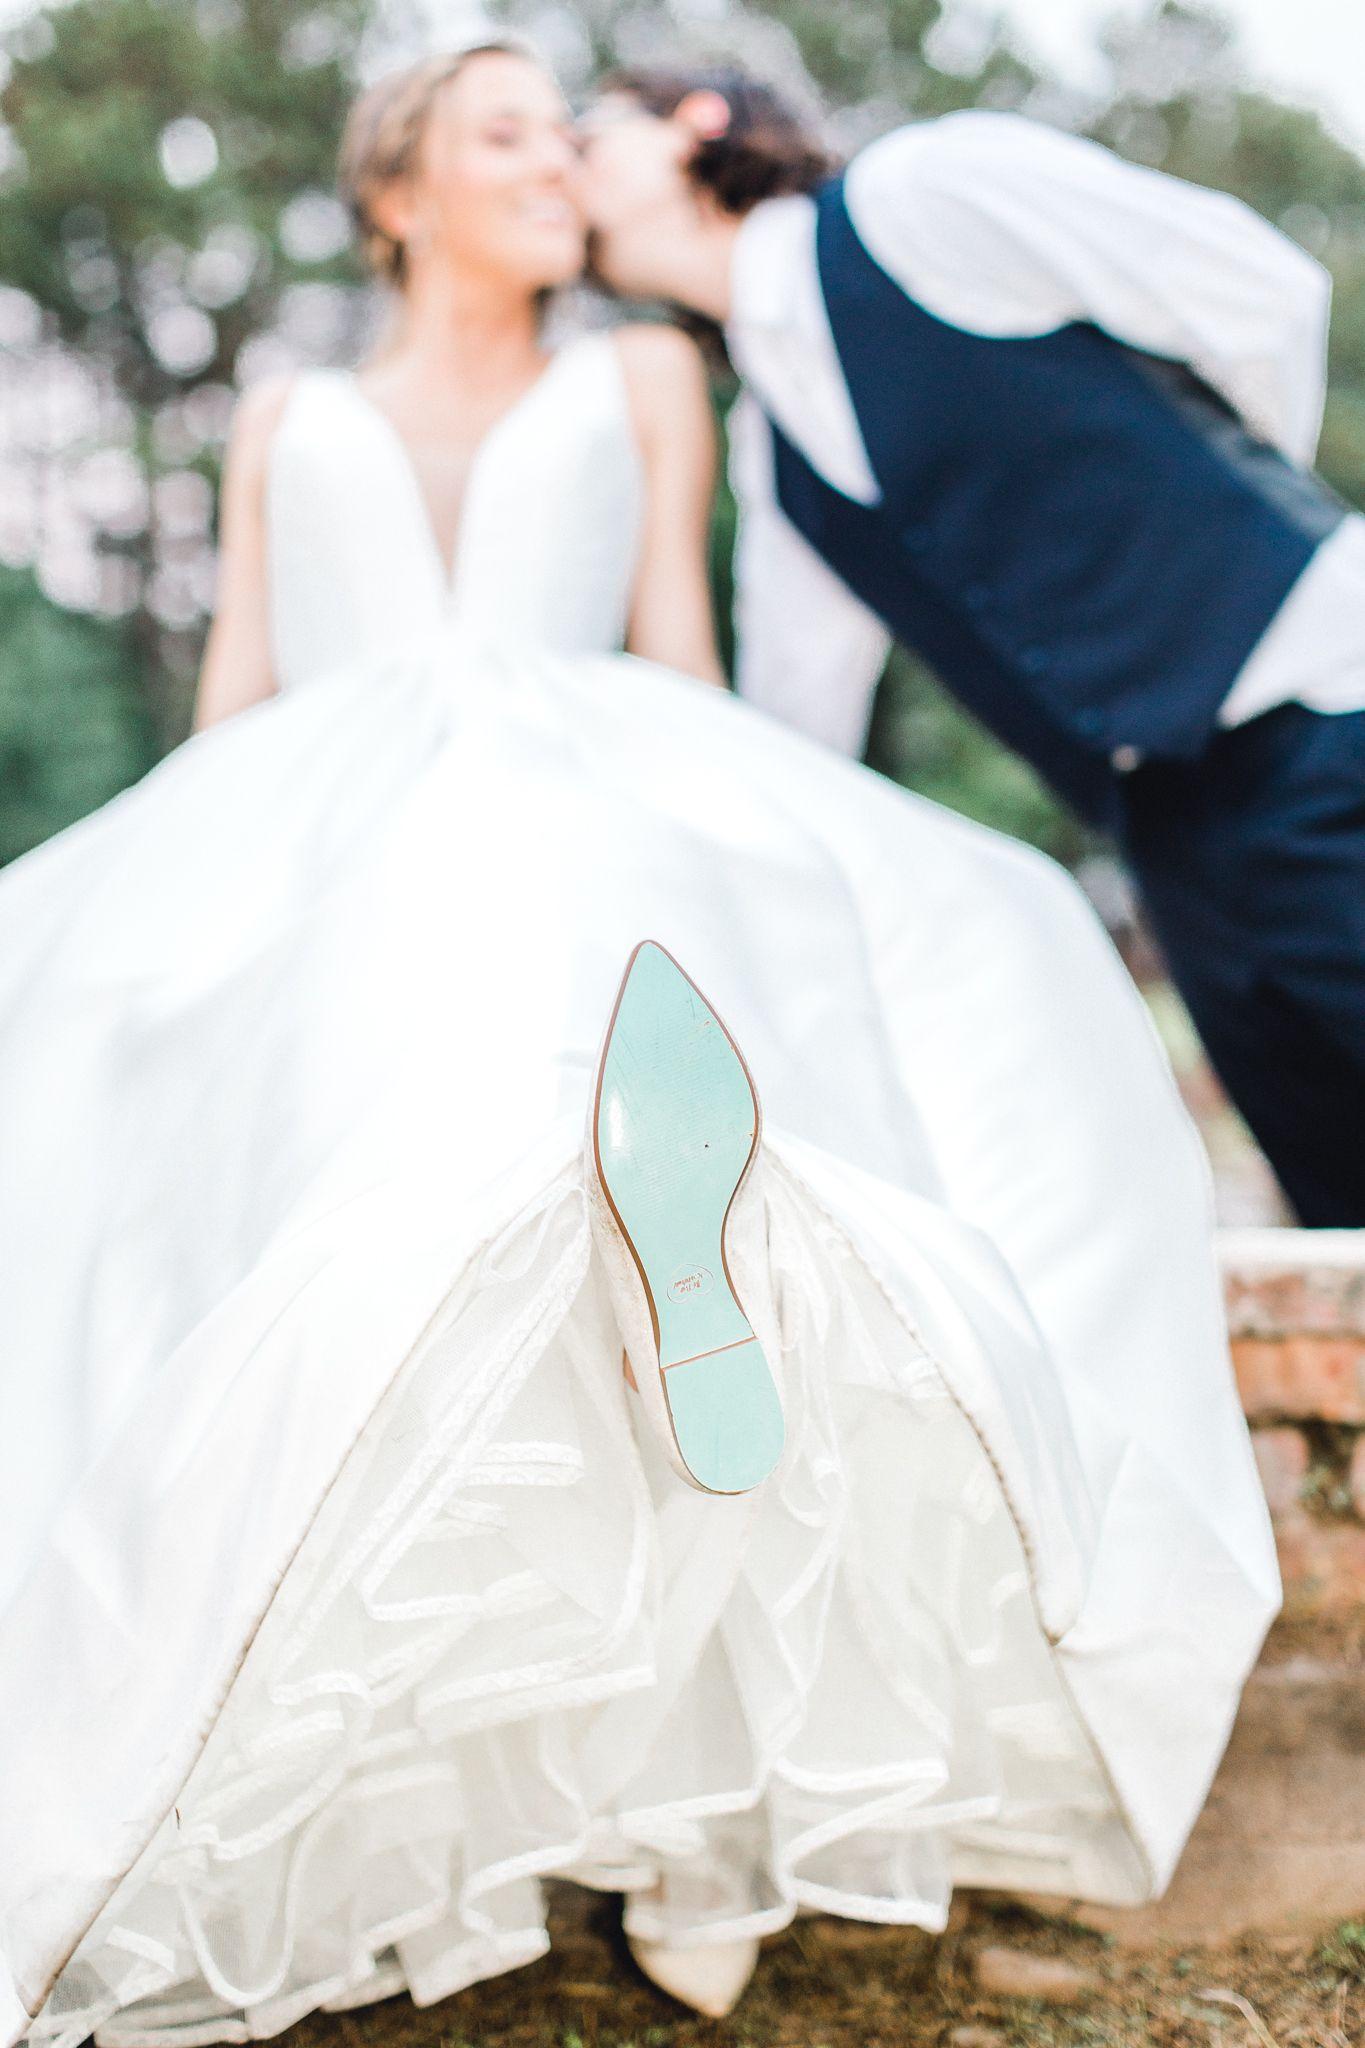 Blue Bottom Wedding Shoes Runney Mede Planation Wedding Charleston Wedding Charleston Wedding Photographer Wedding Photographers Intimate Wedding Photography